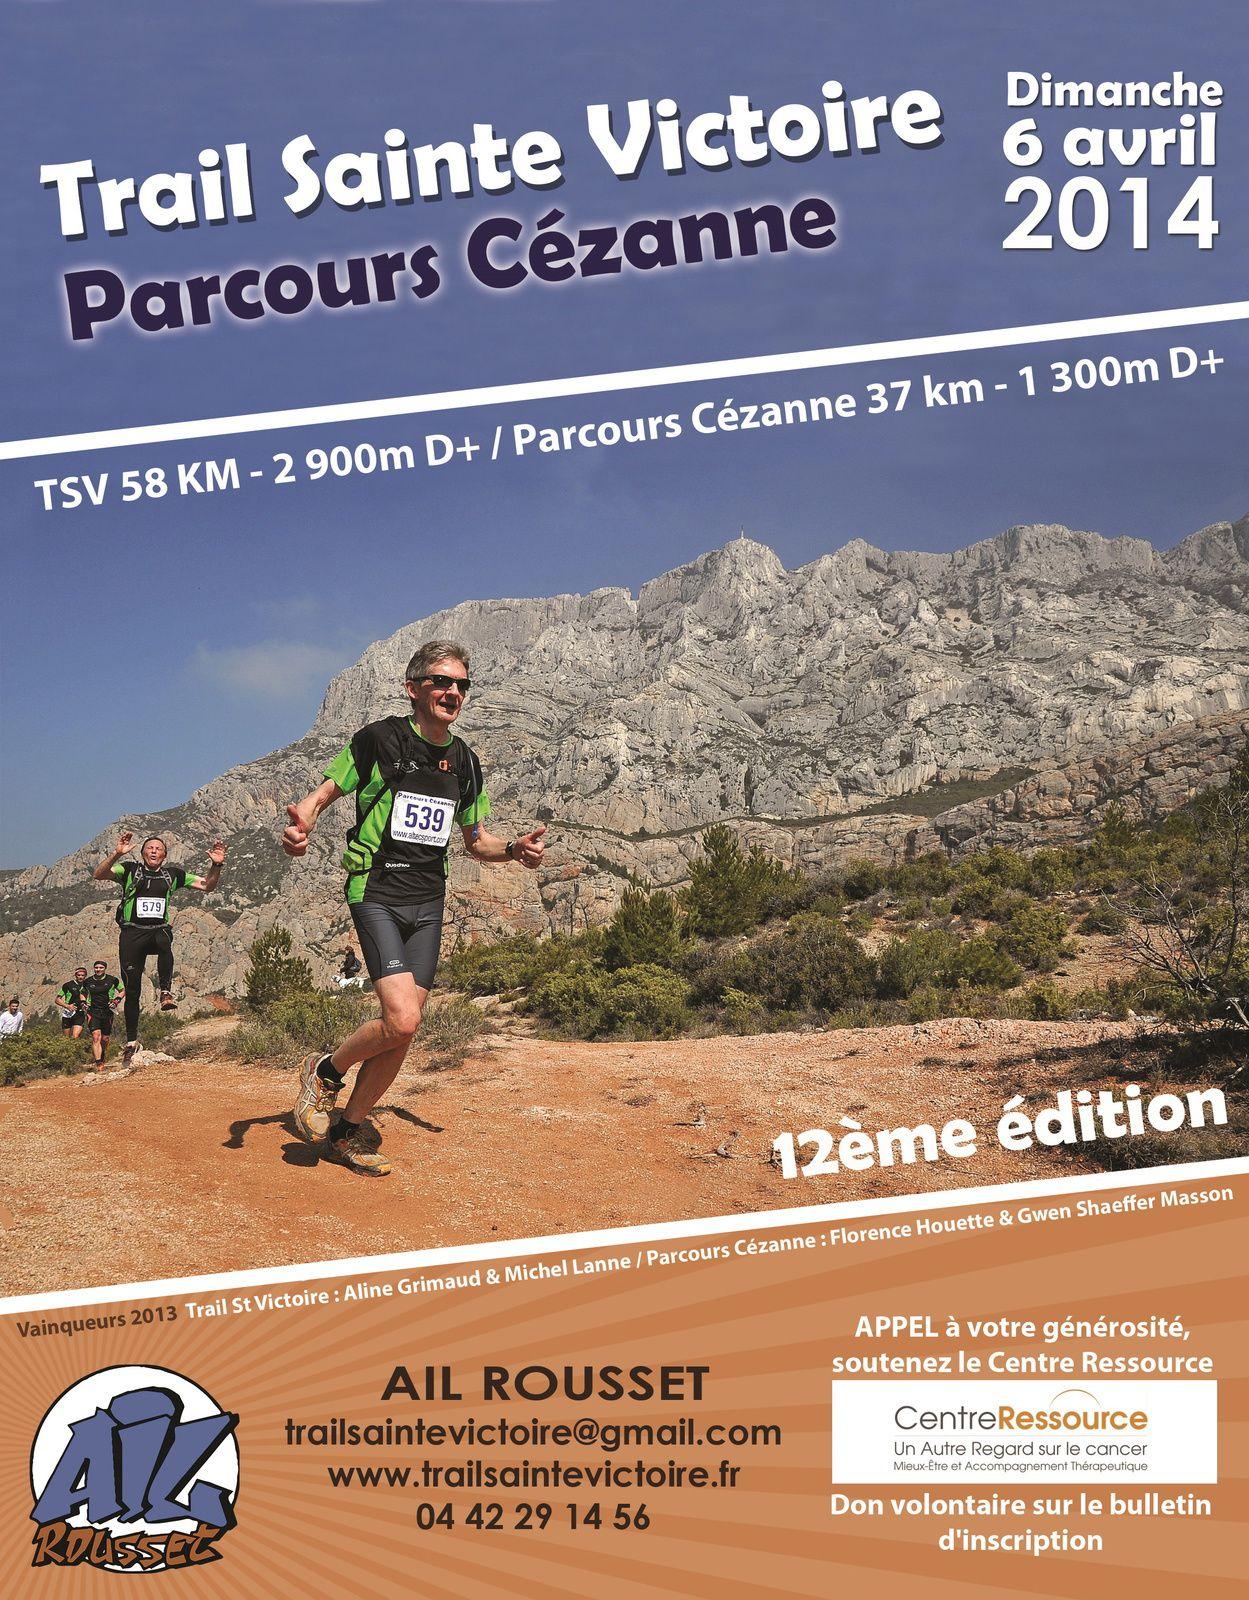 Trail de la Sainte Victoire : chaud !! chaud !! chaud !!